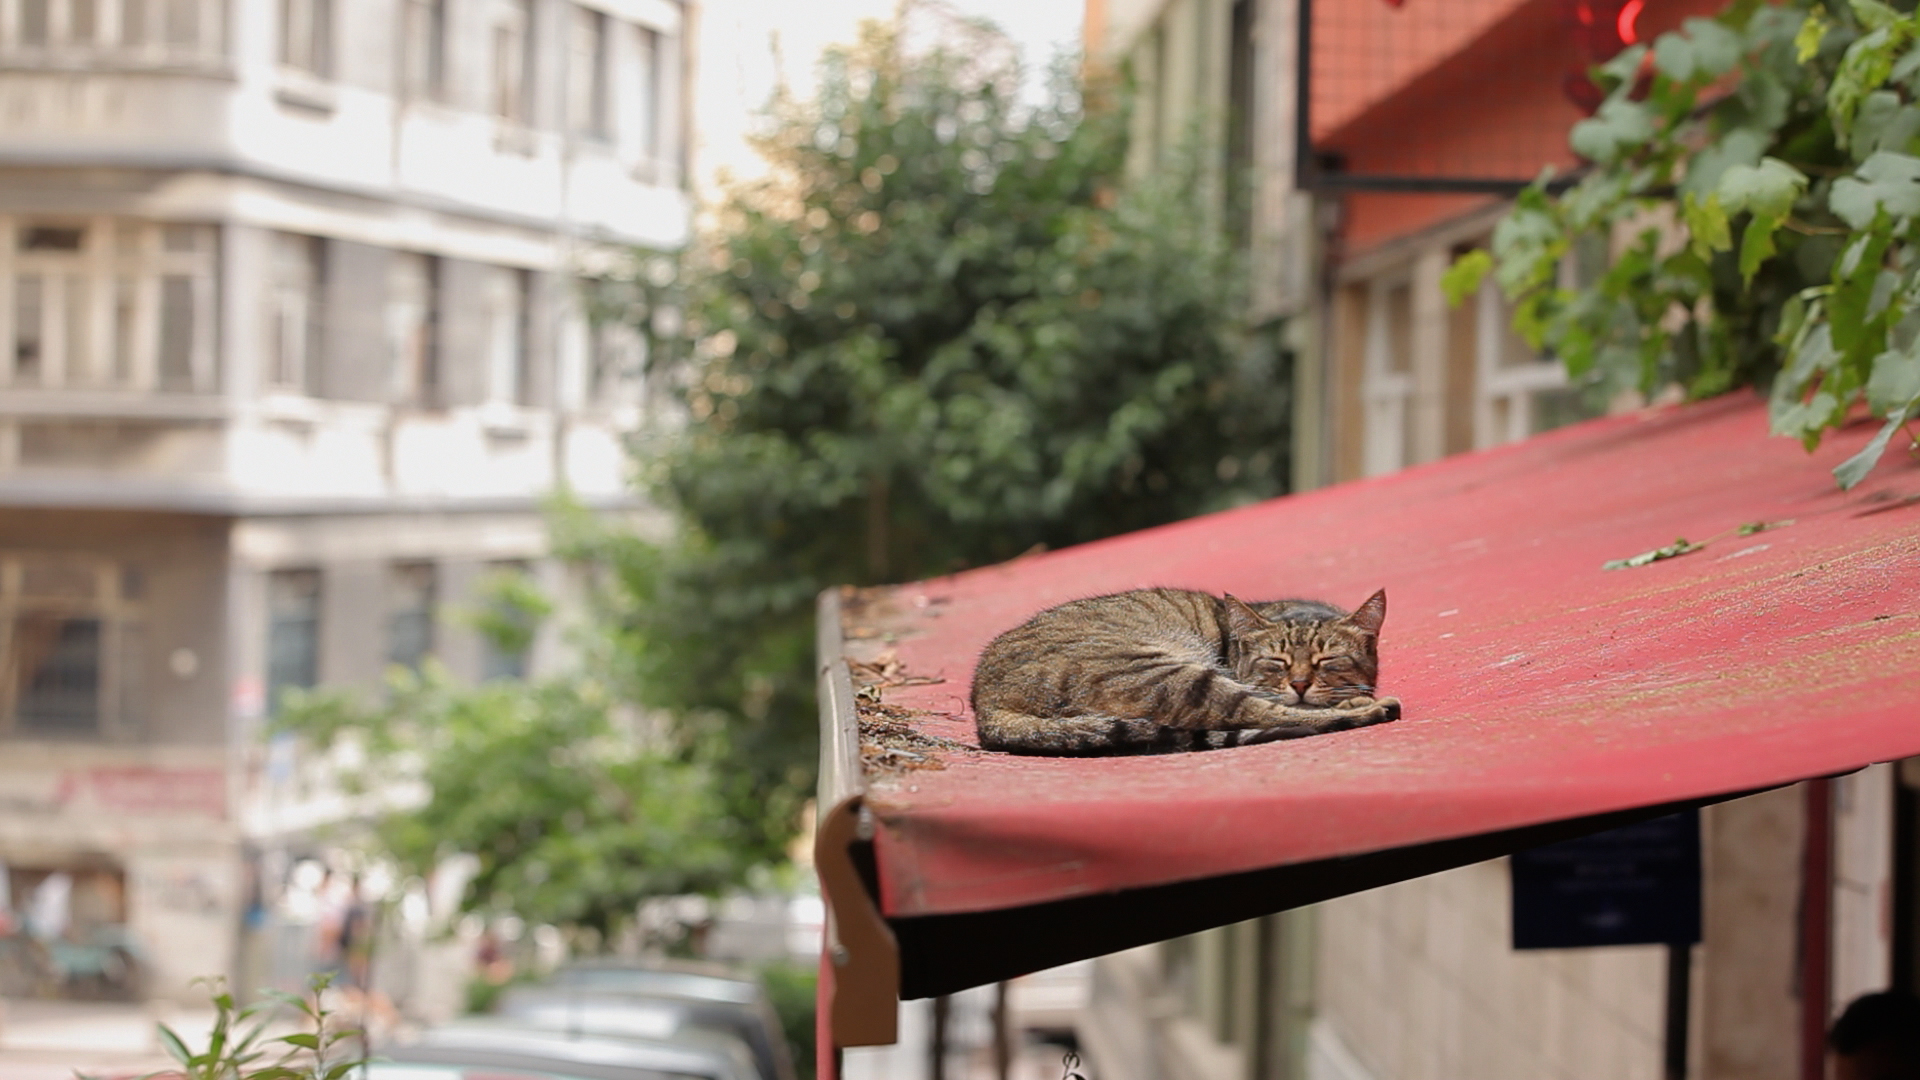 Cat napping in Ceyda Torun's  Kedi.